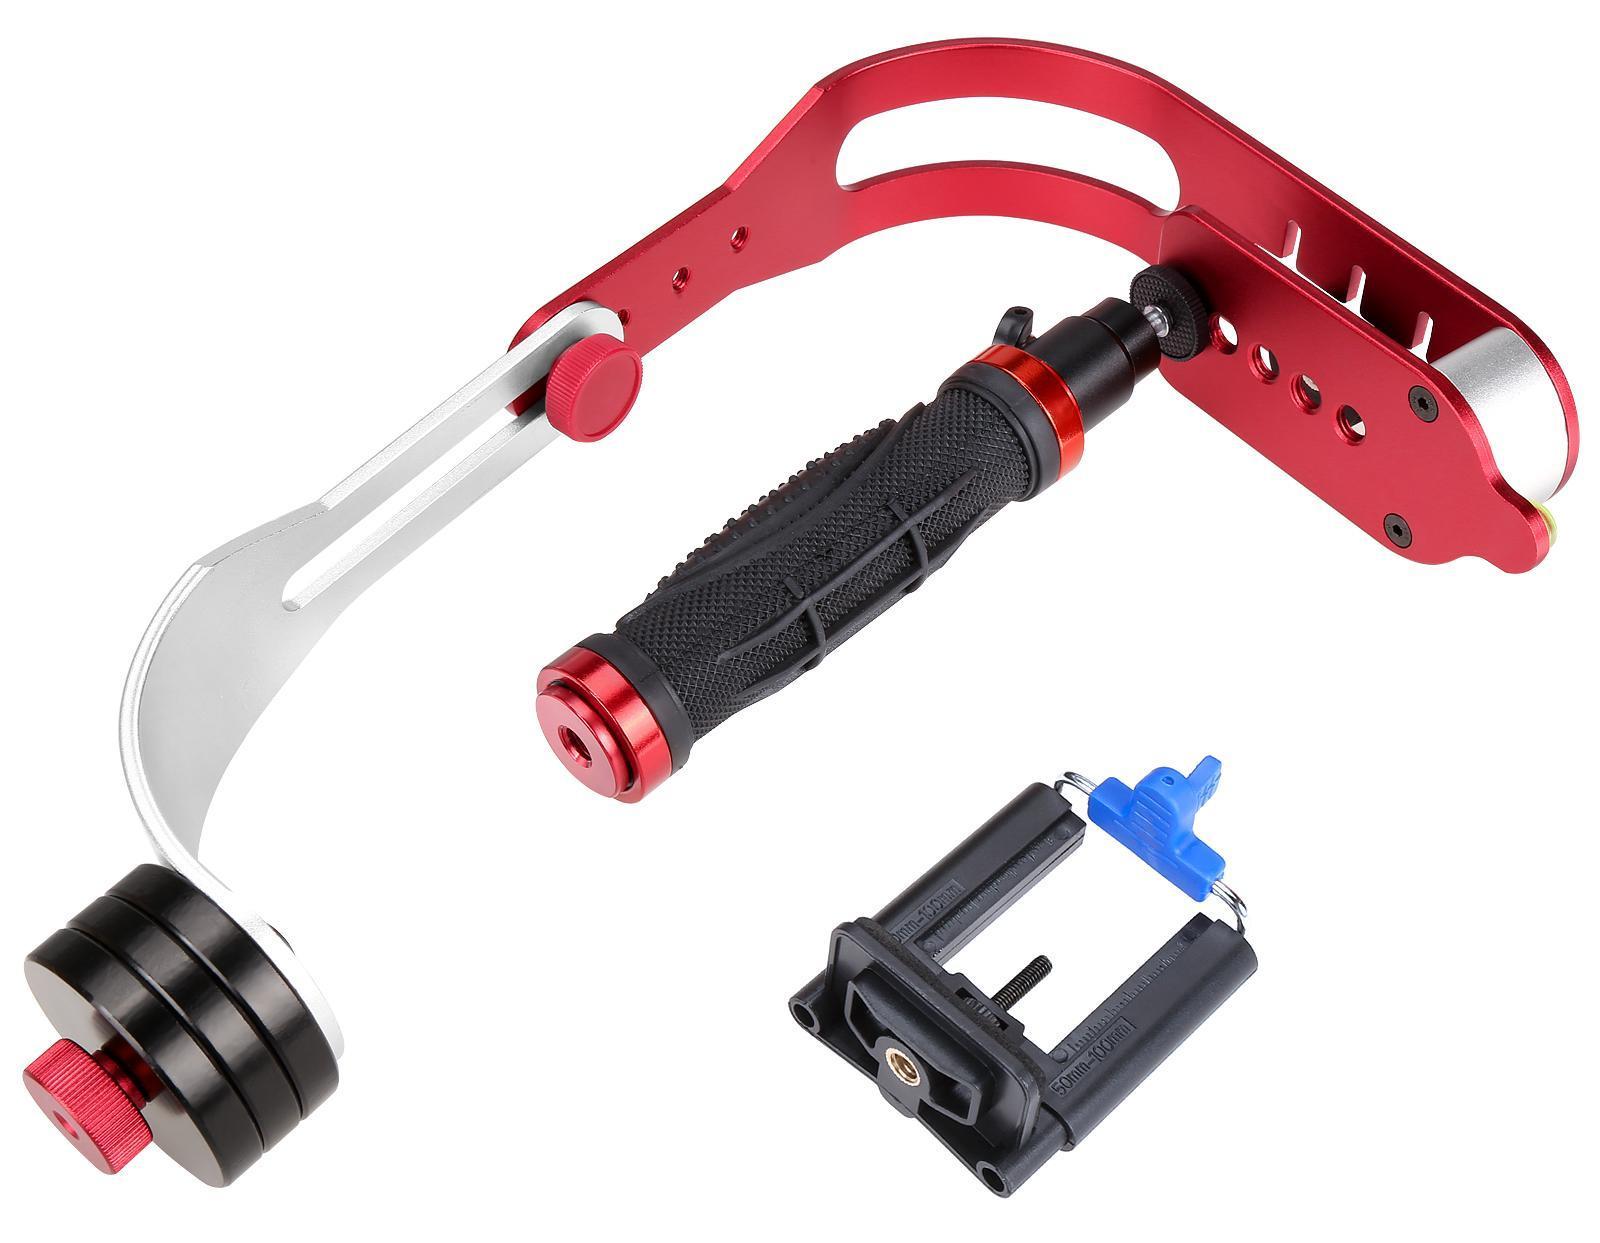 Hand-held Steady Cam Video Stabilizer Motion Steadicam Cam For DSLR Camera Camcorder 3